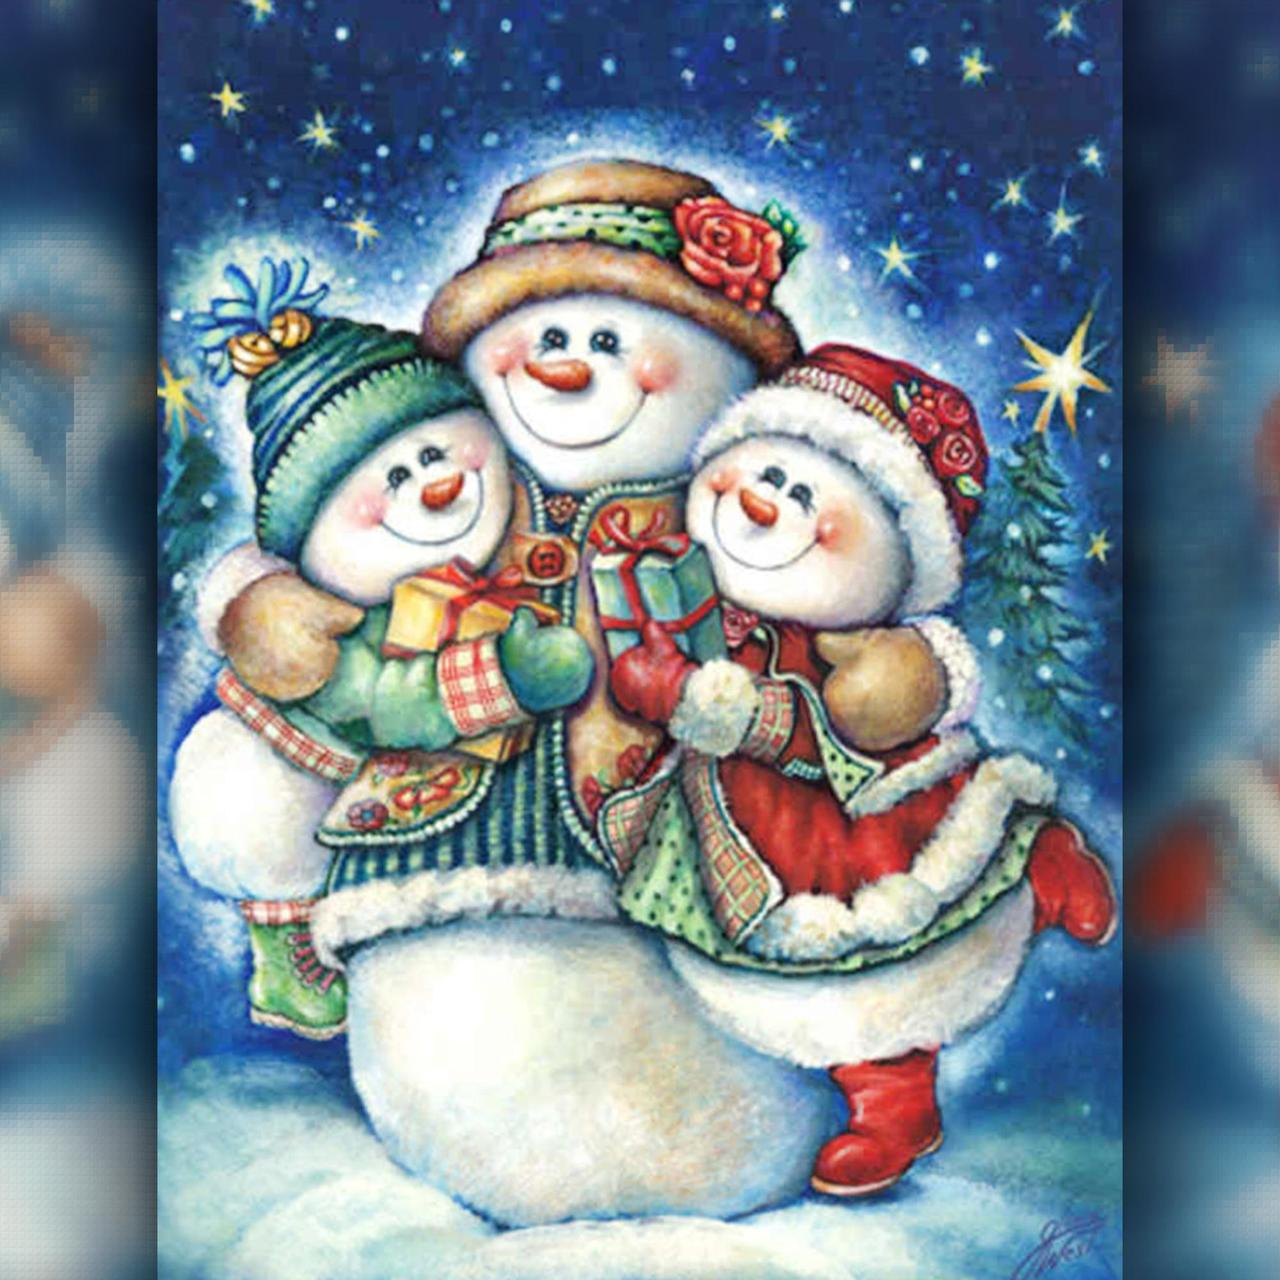 TWD70013 Набор алмазной вышивки Снеговички с подарками